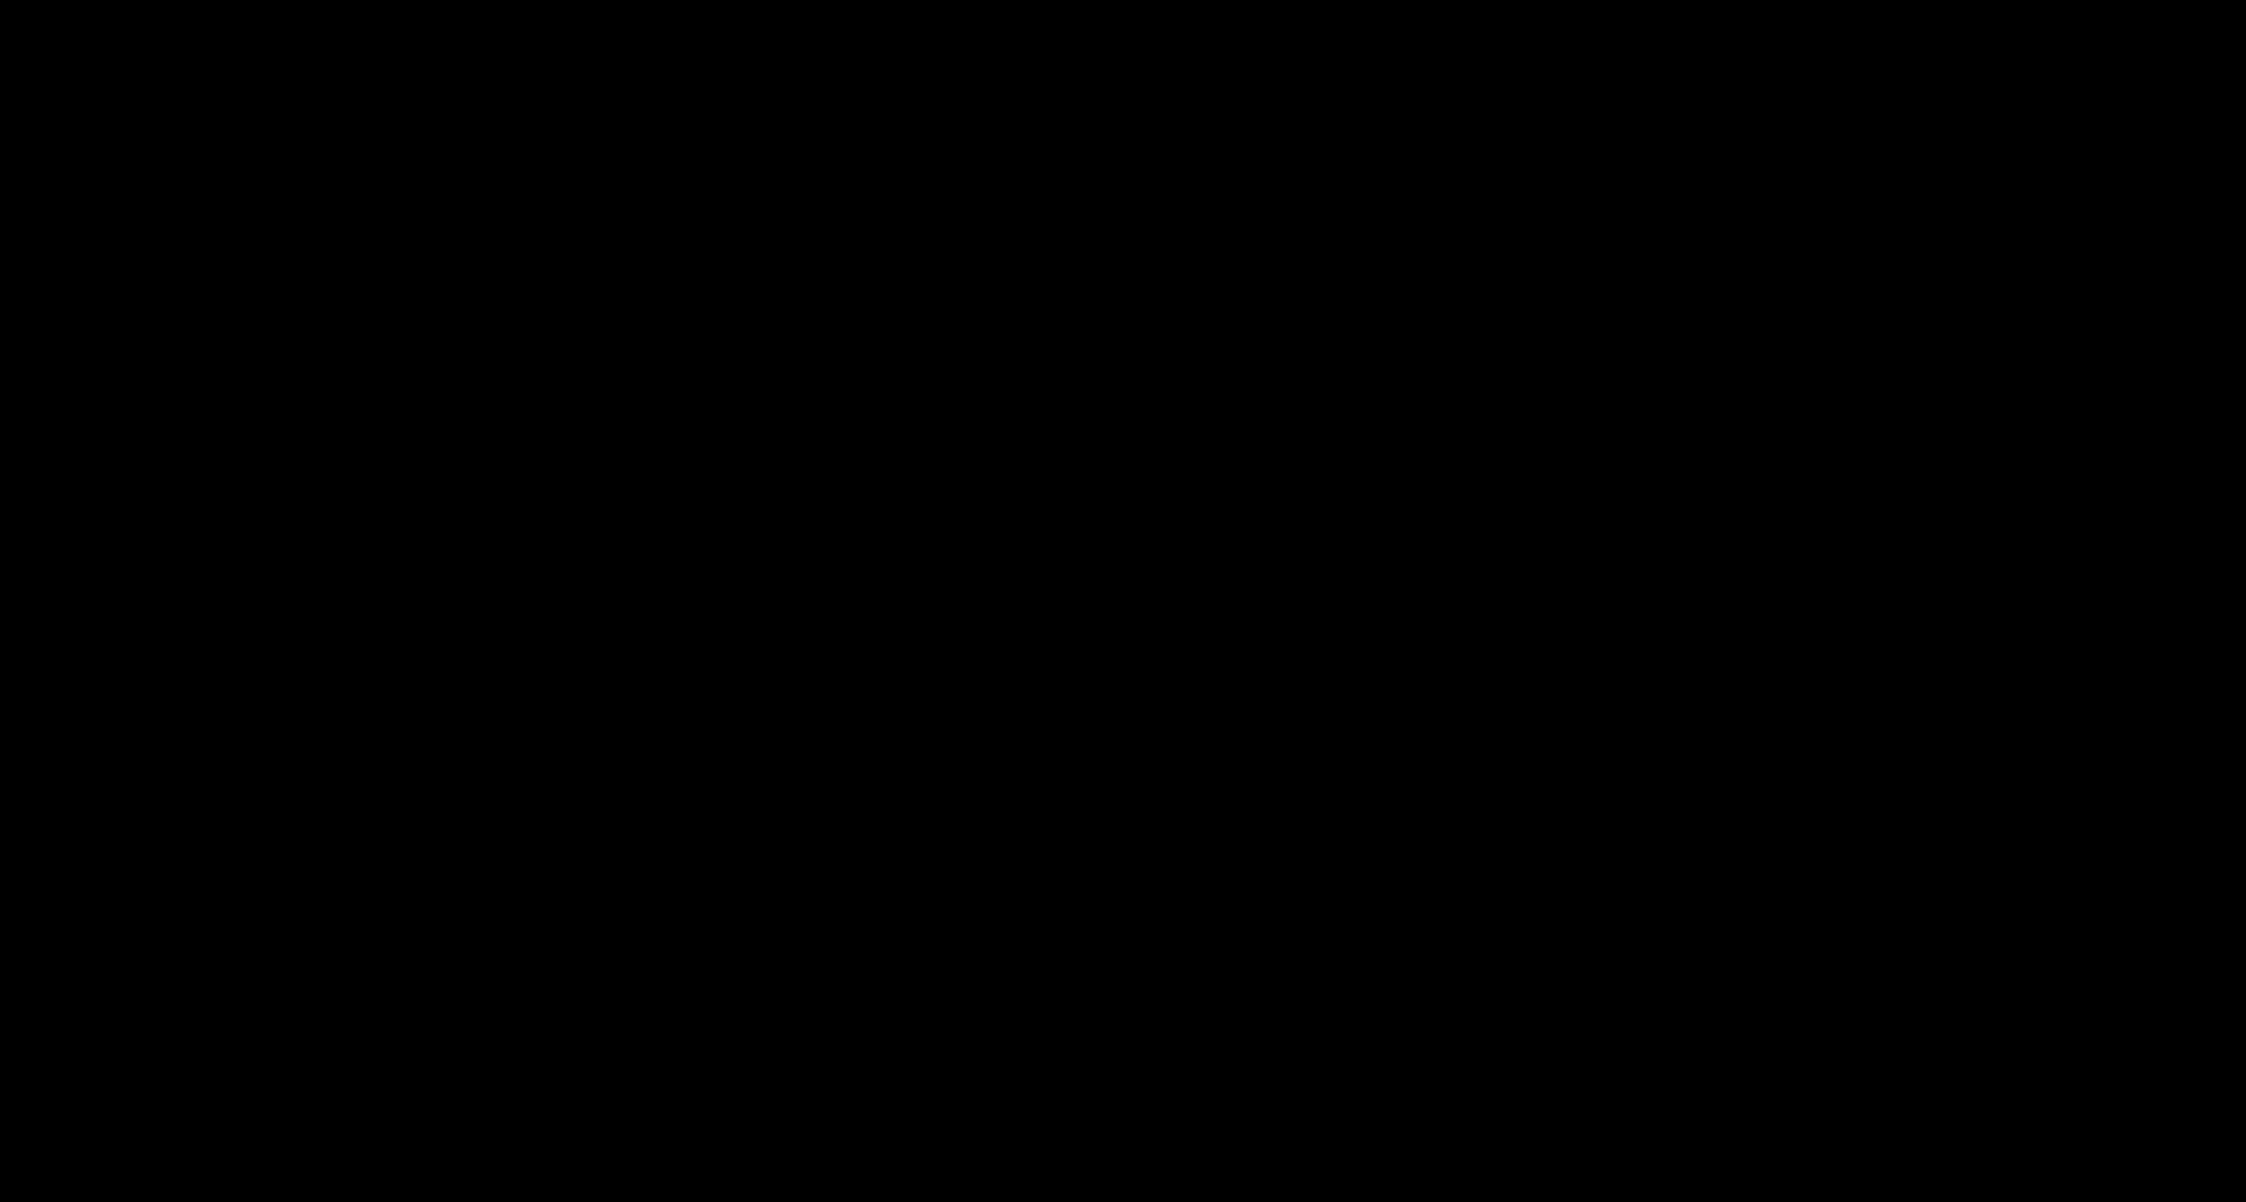 2246x1202 Clipart